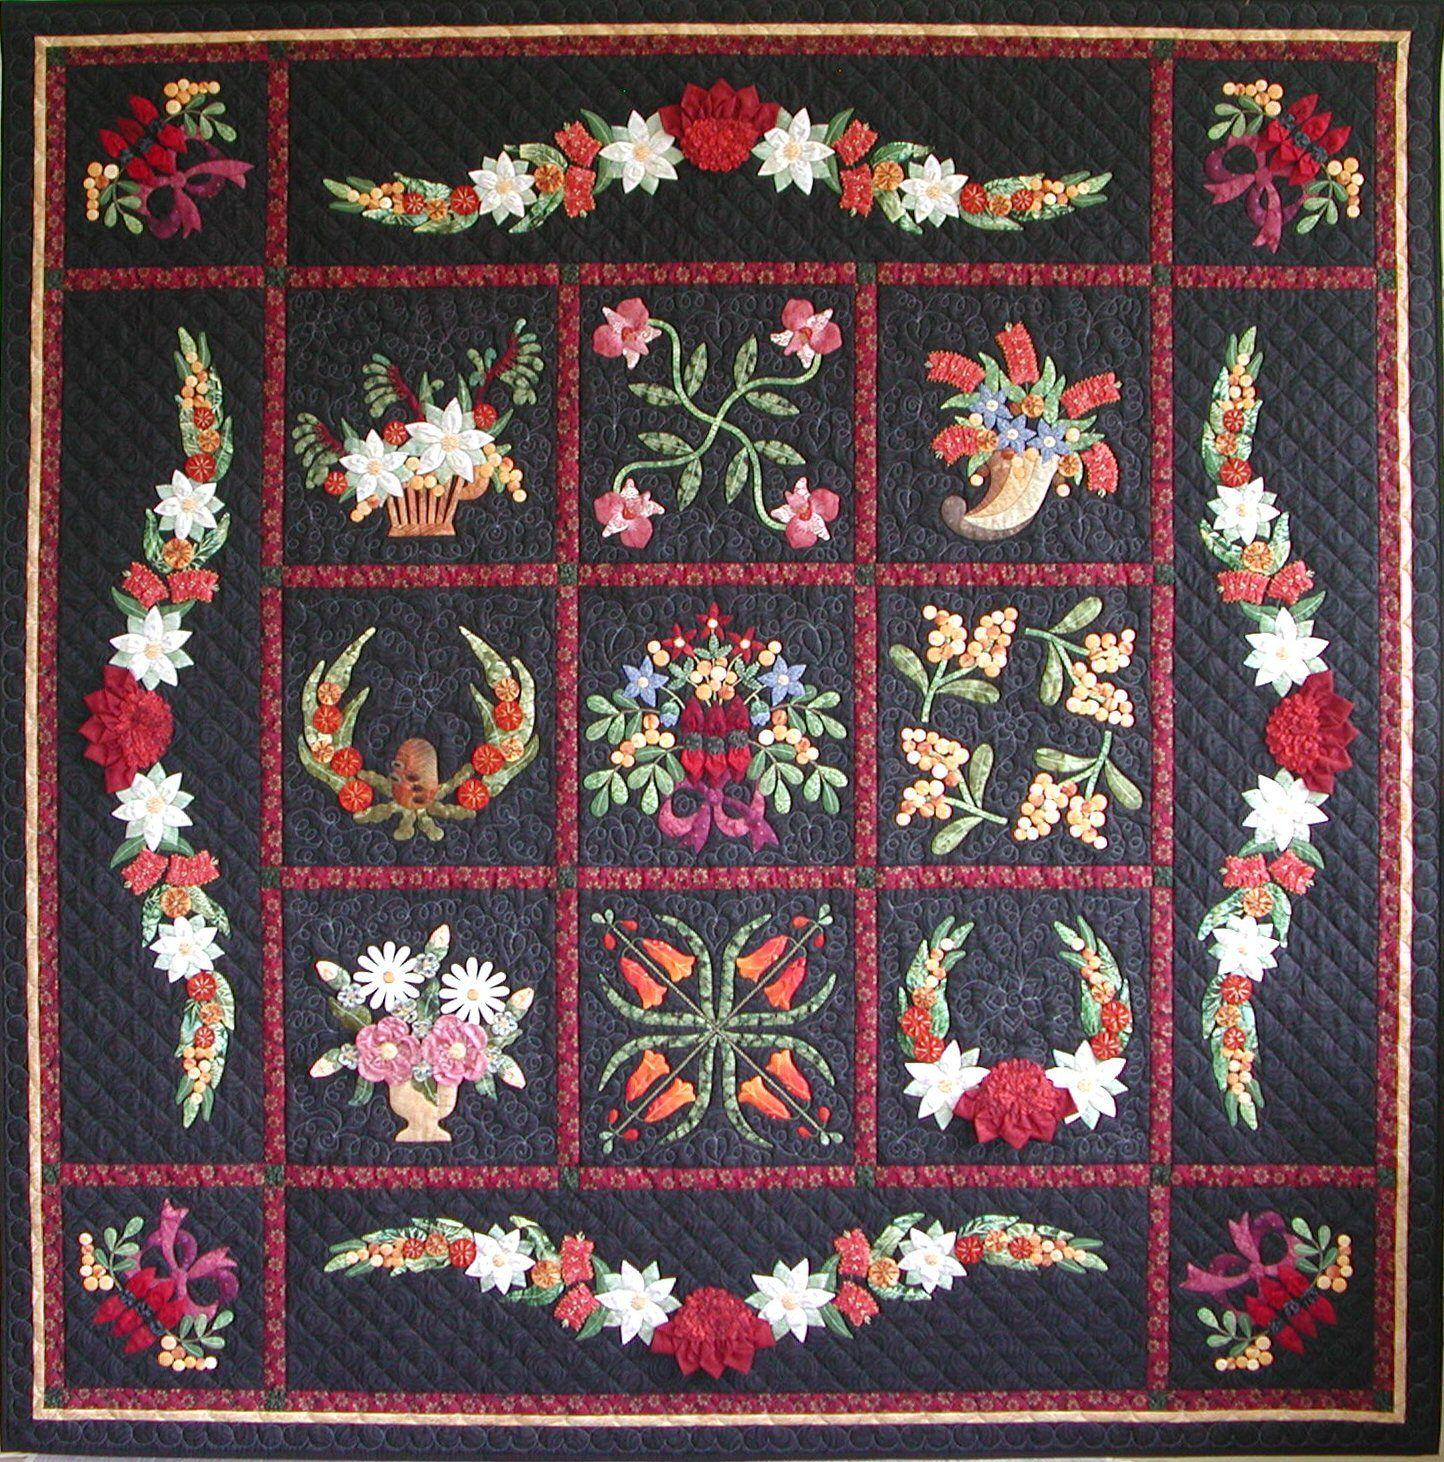 Flower quilt made by Eva Johansen DK